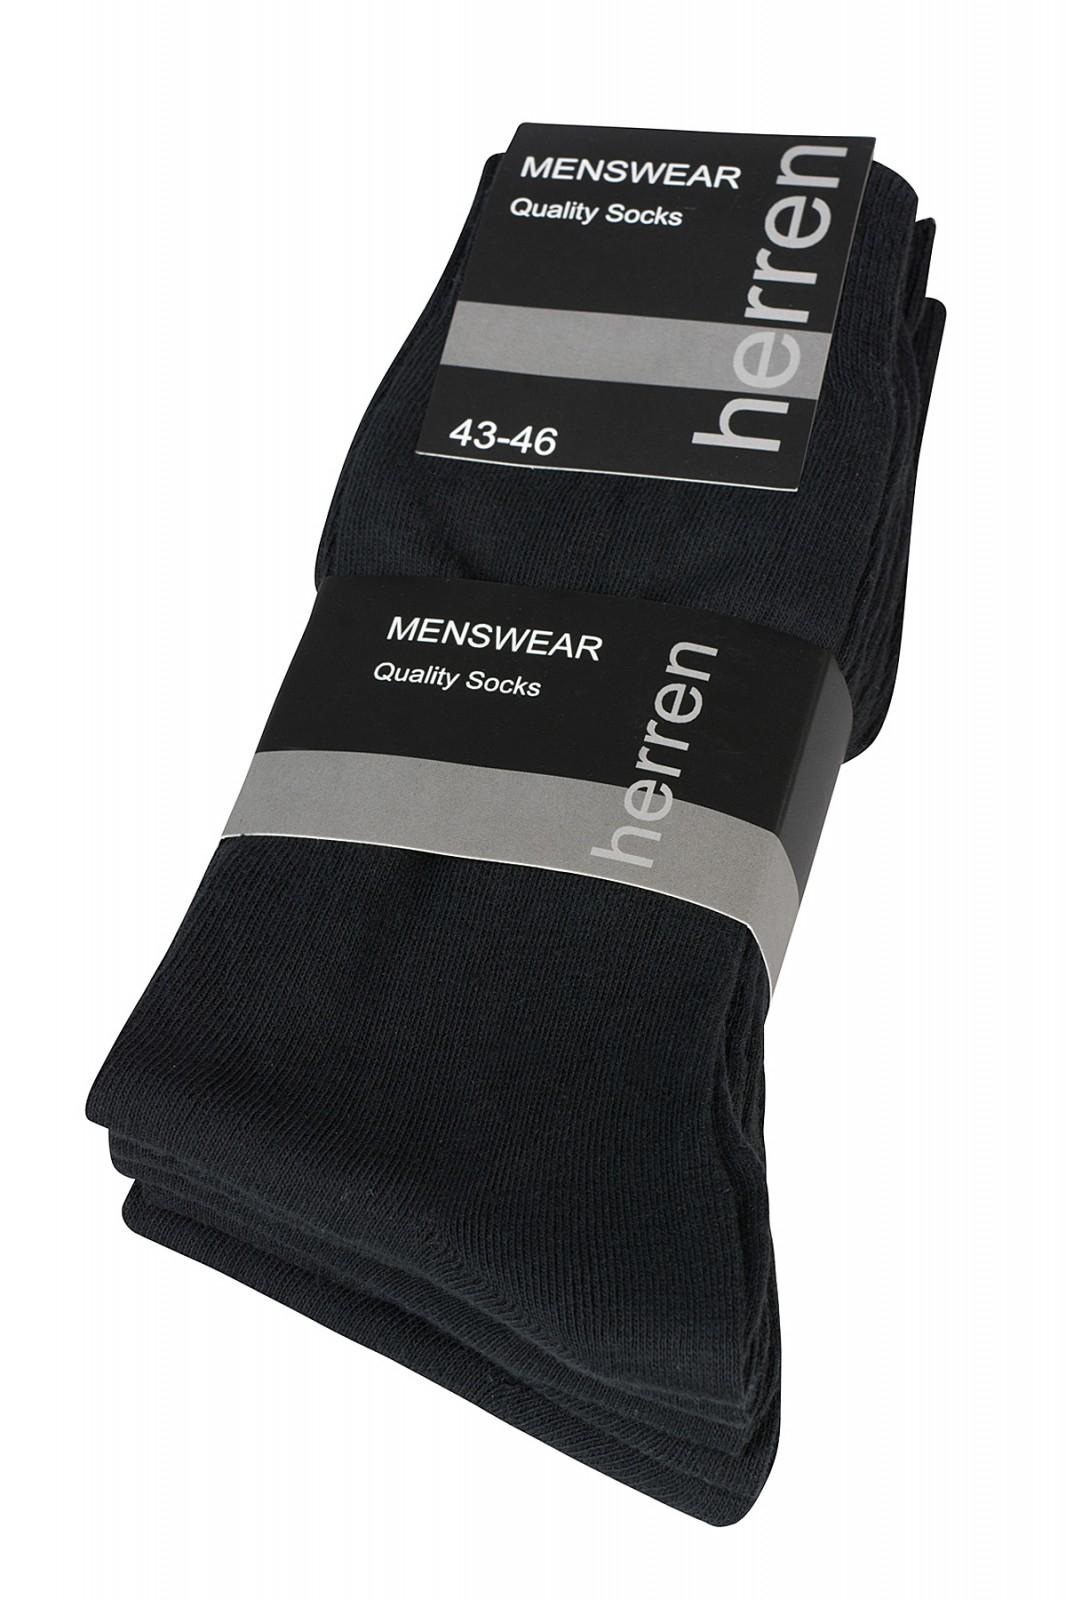 [outlet46.de] 5er Pack CNB Herren Socken Schwarz [ 39-42 + 43-46 ]